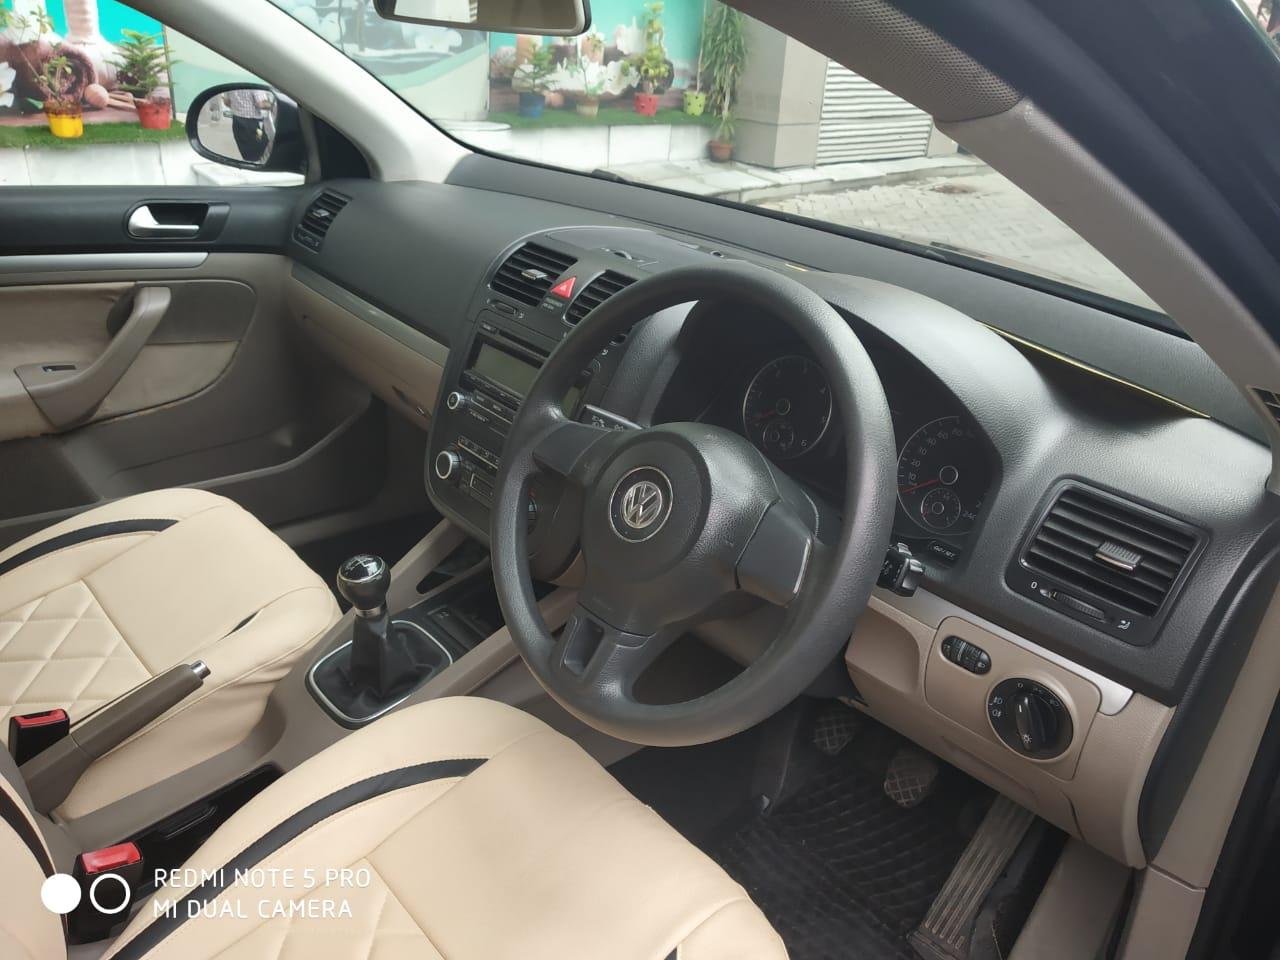 2011 Used Volkswagen Jetta 2.0 TDI HIGHLINE MT